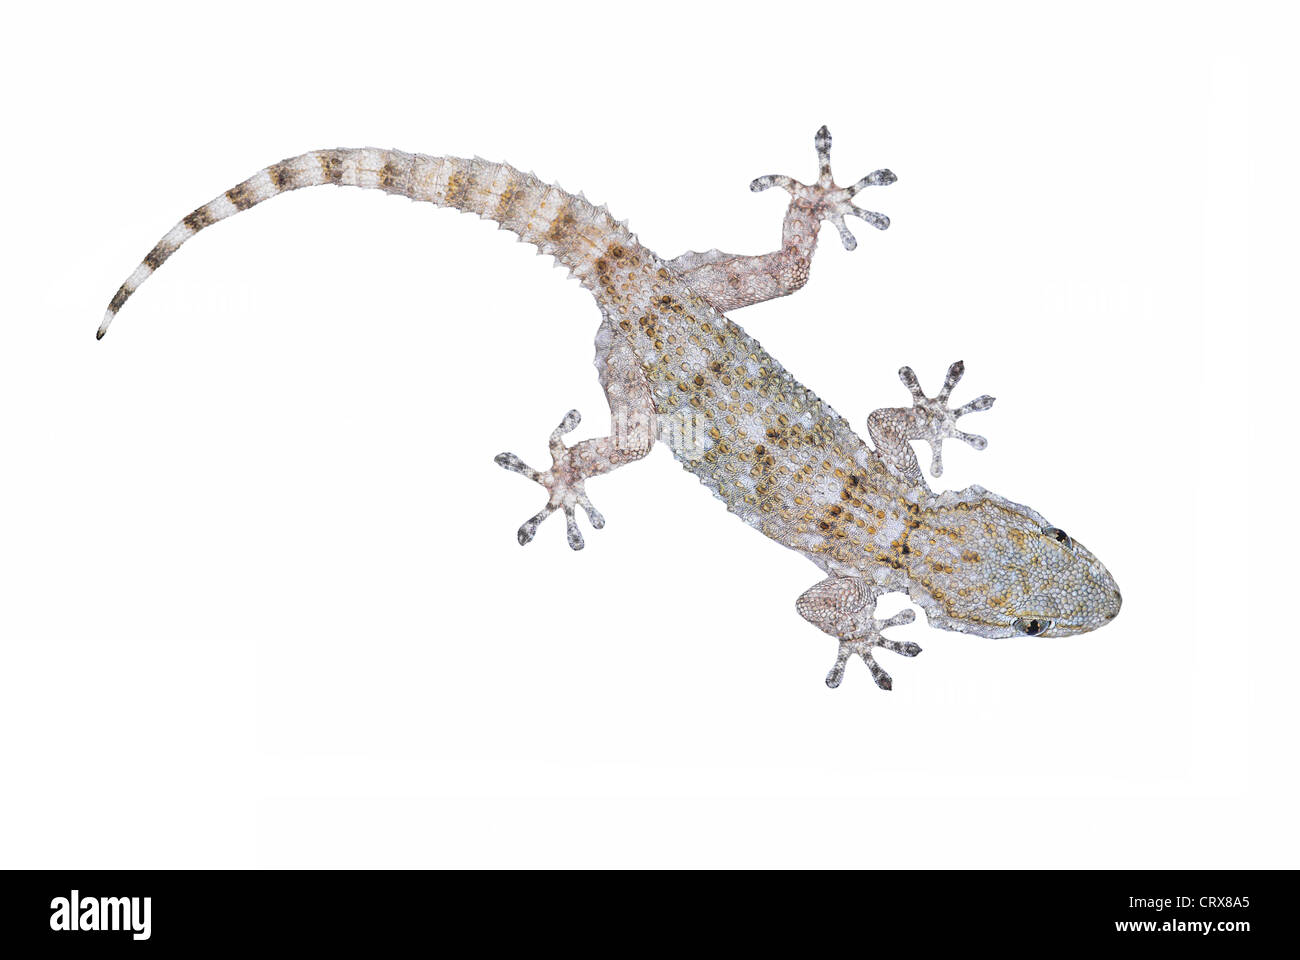 European Common Gecko, Tarentola mauritanica - Stock Image